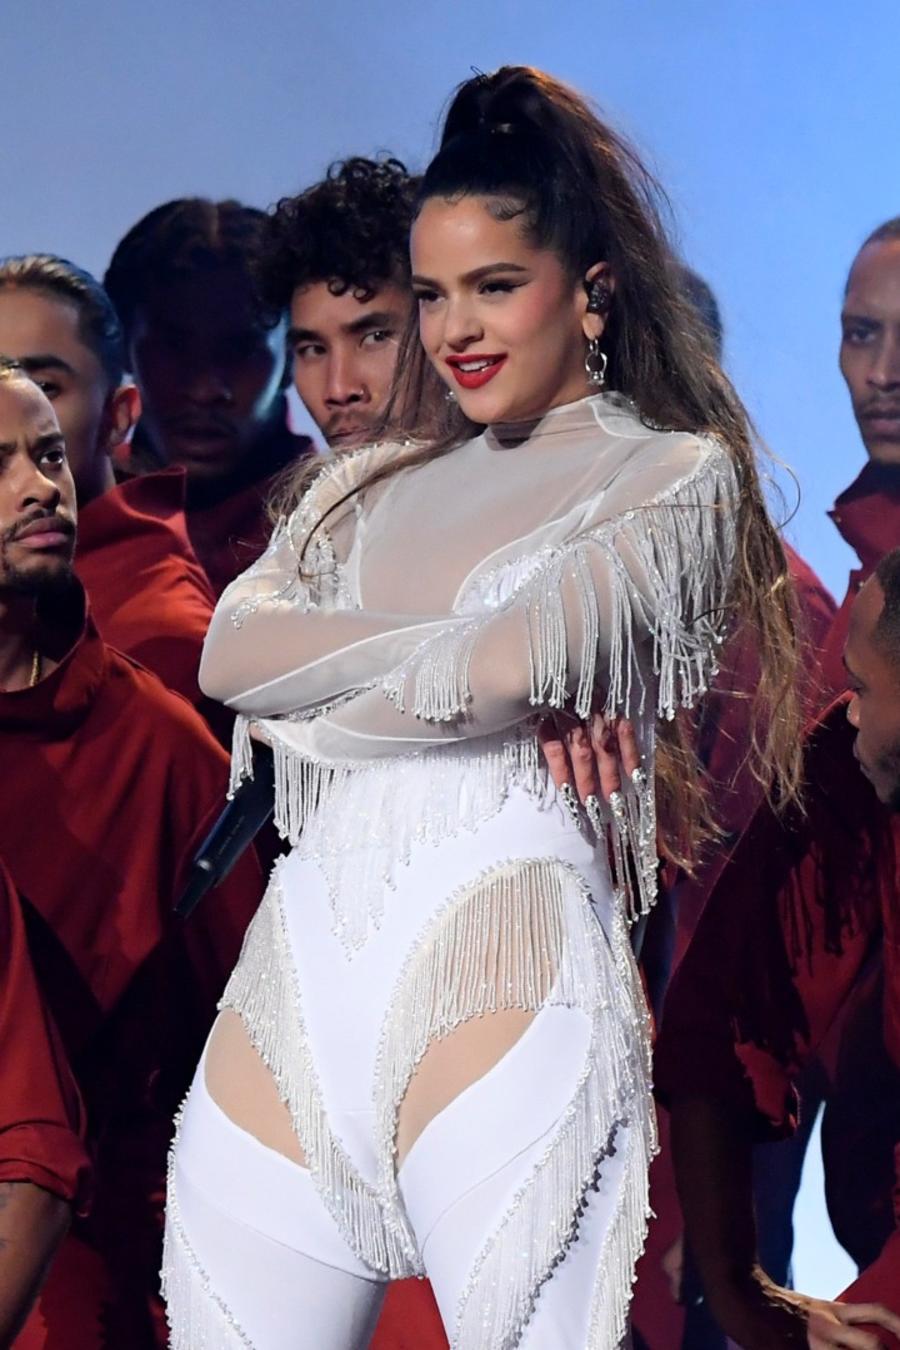 Rosalia performing live at Grammys